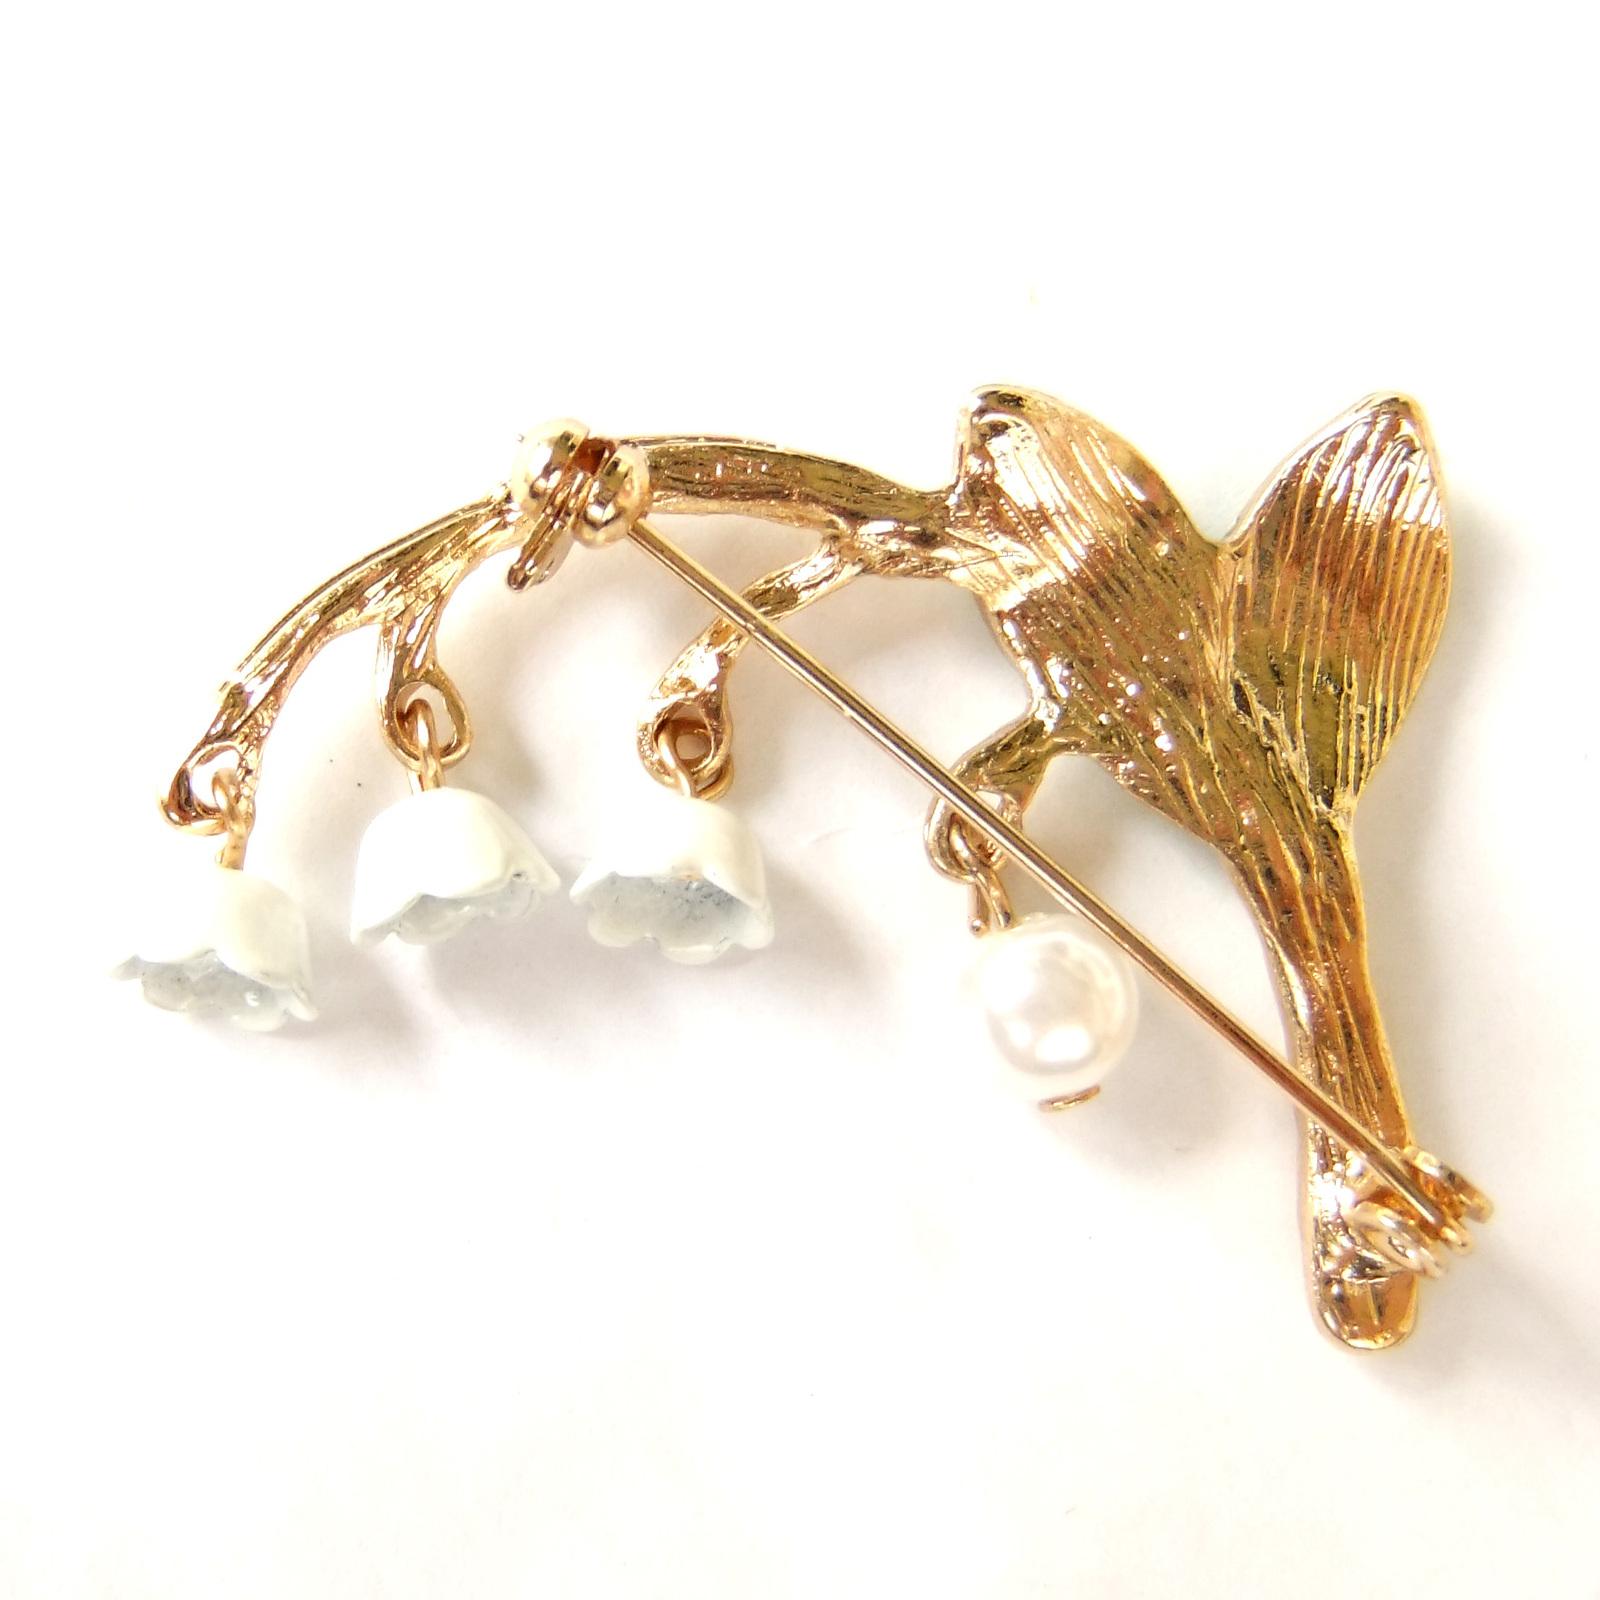 Lily of The Valley Green Leaf White Flower Lovely Elegant Enamel Brooch Pin Gift